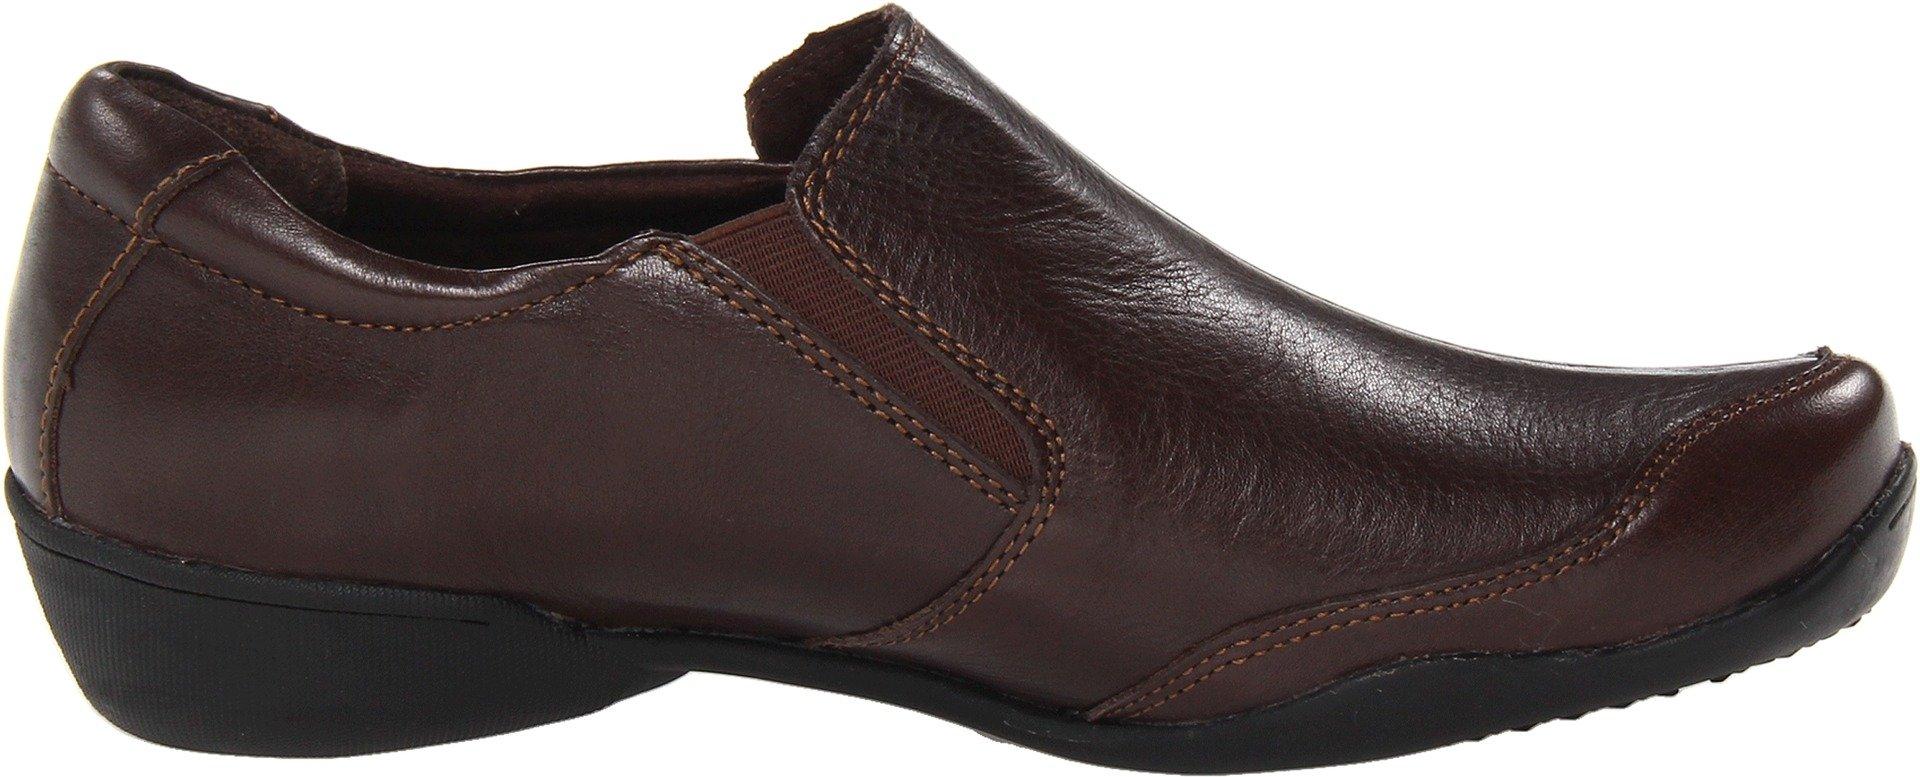 Taos Women's Encore Flat,Chocolate,7 M US by Taos Footwear (Image #6)